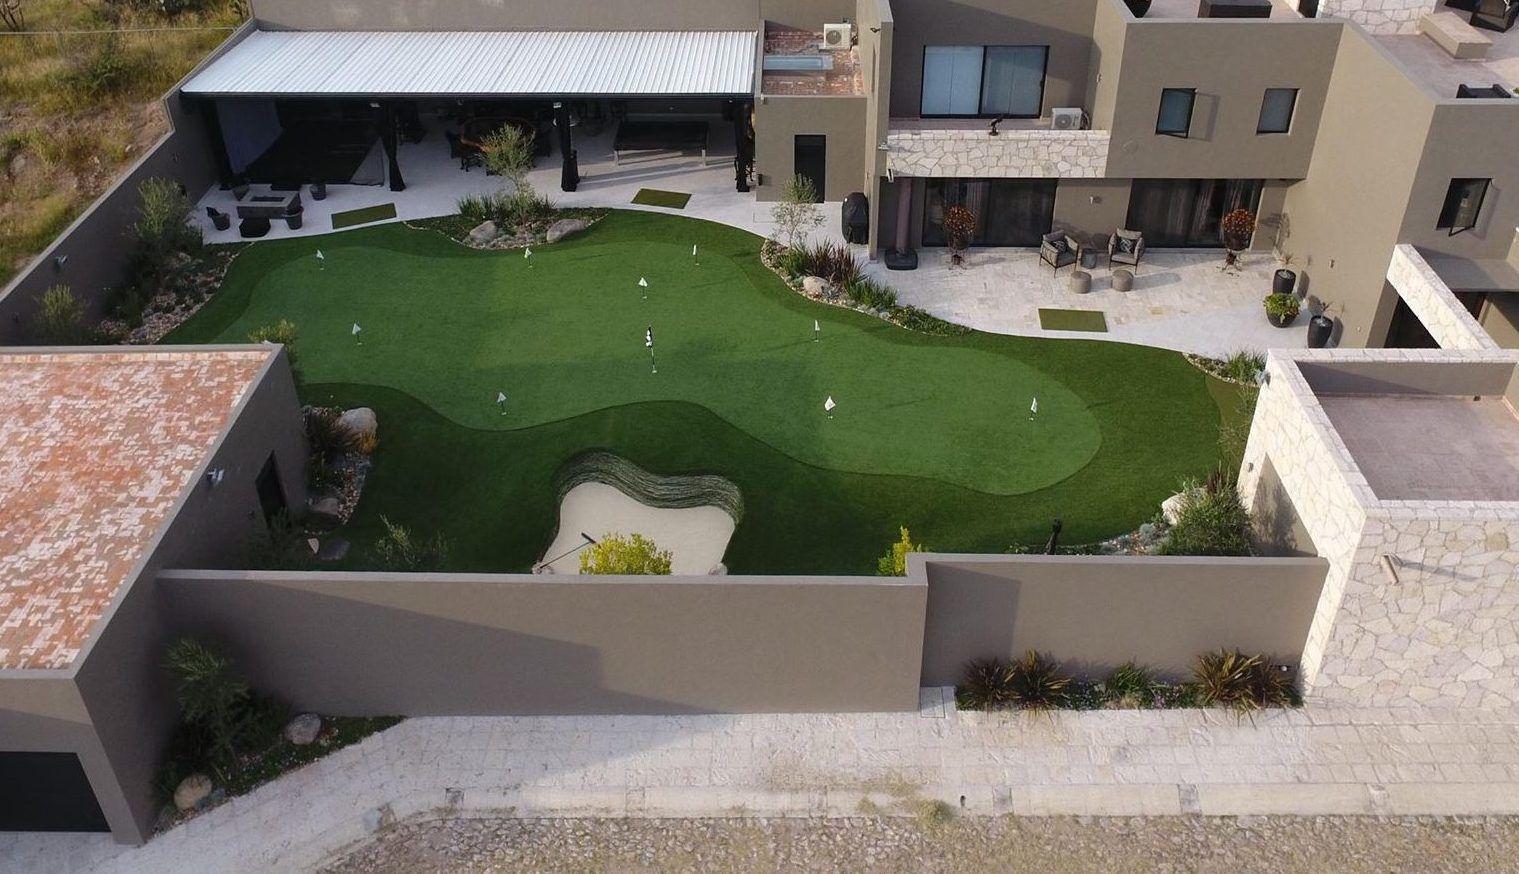 Arizona custom backyard putting greens installers